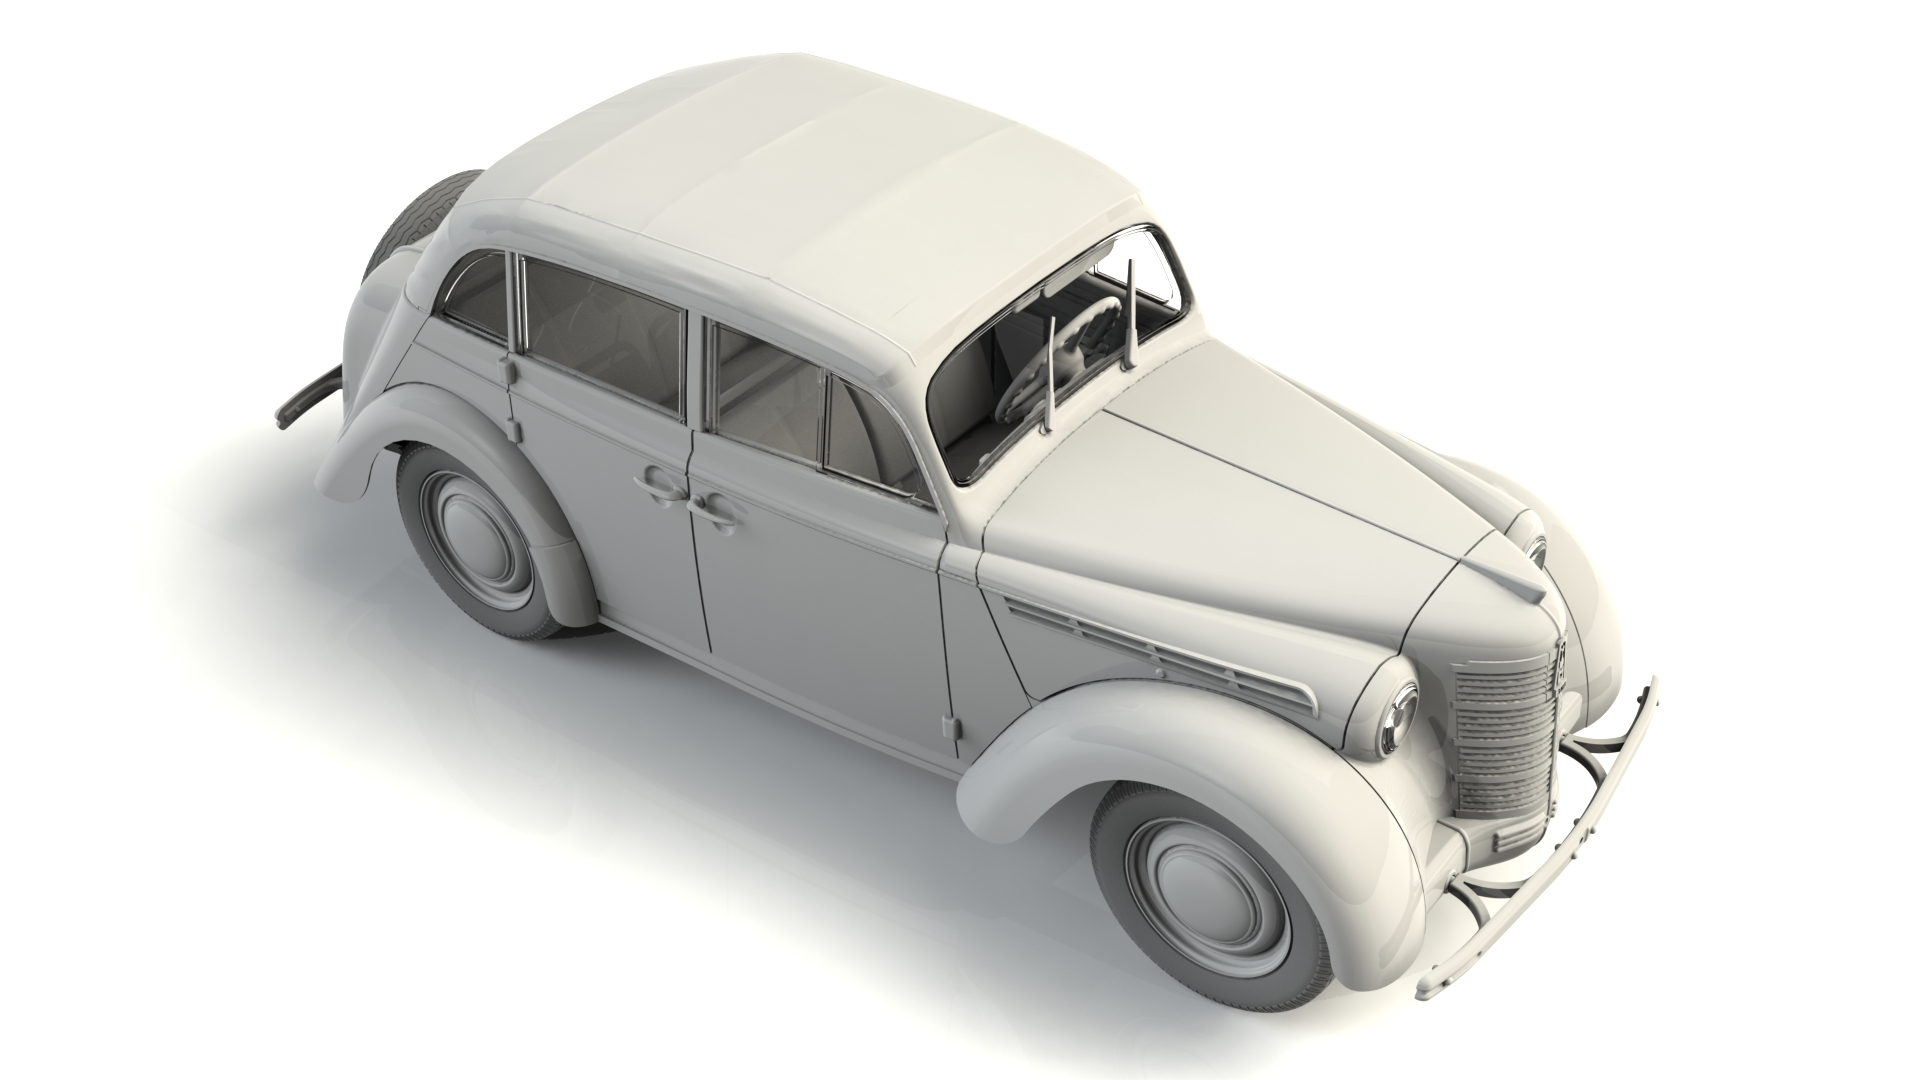 1/35 Moskvitch-401-420A, Soviet Passenger Car 35484